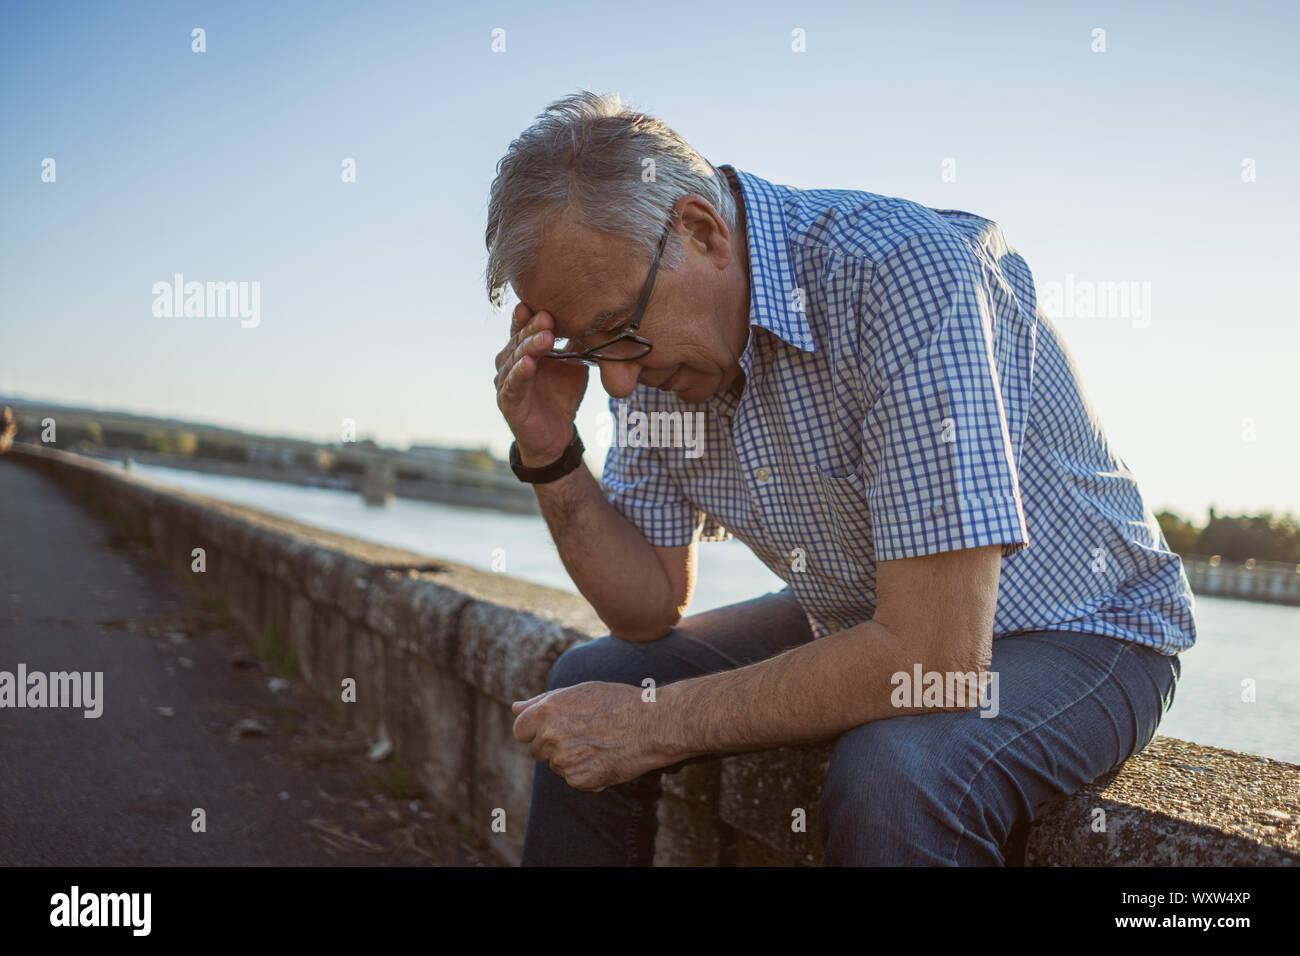 Outdoor portrait of senior man who is having headache. Stock Photo